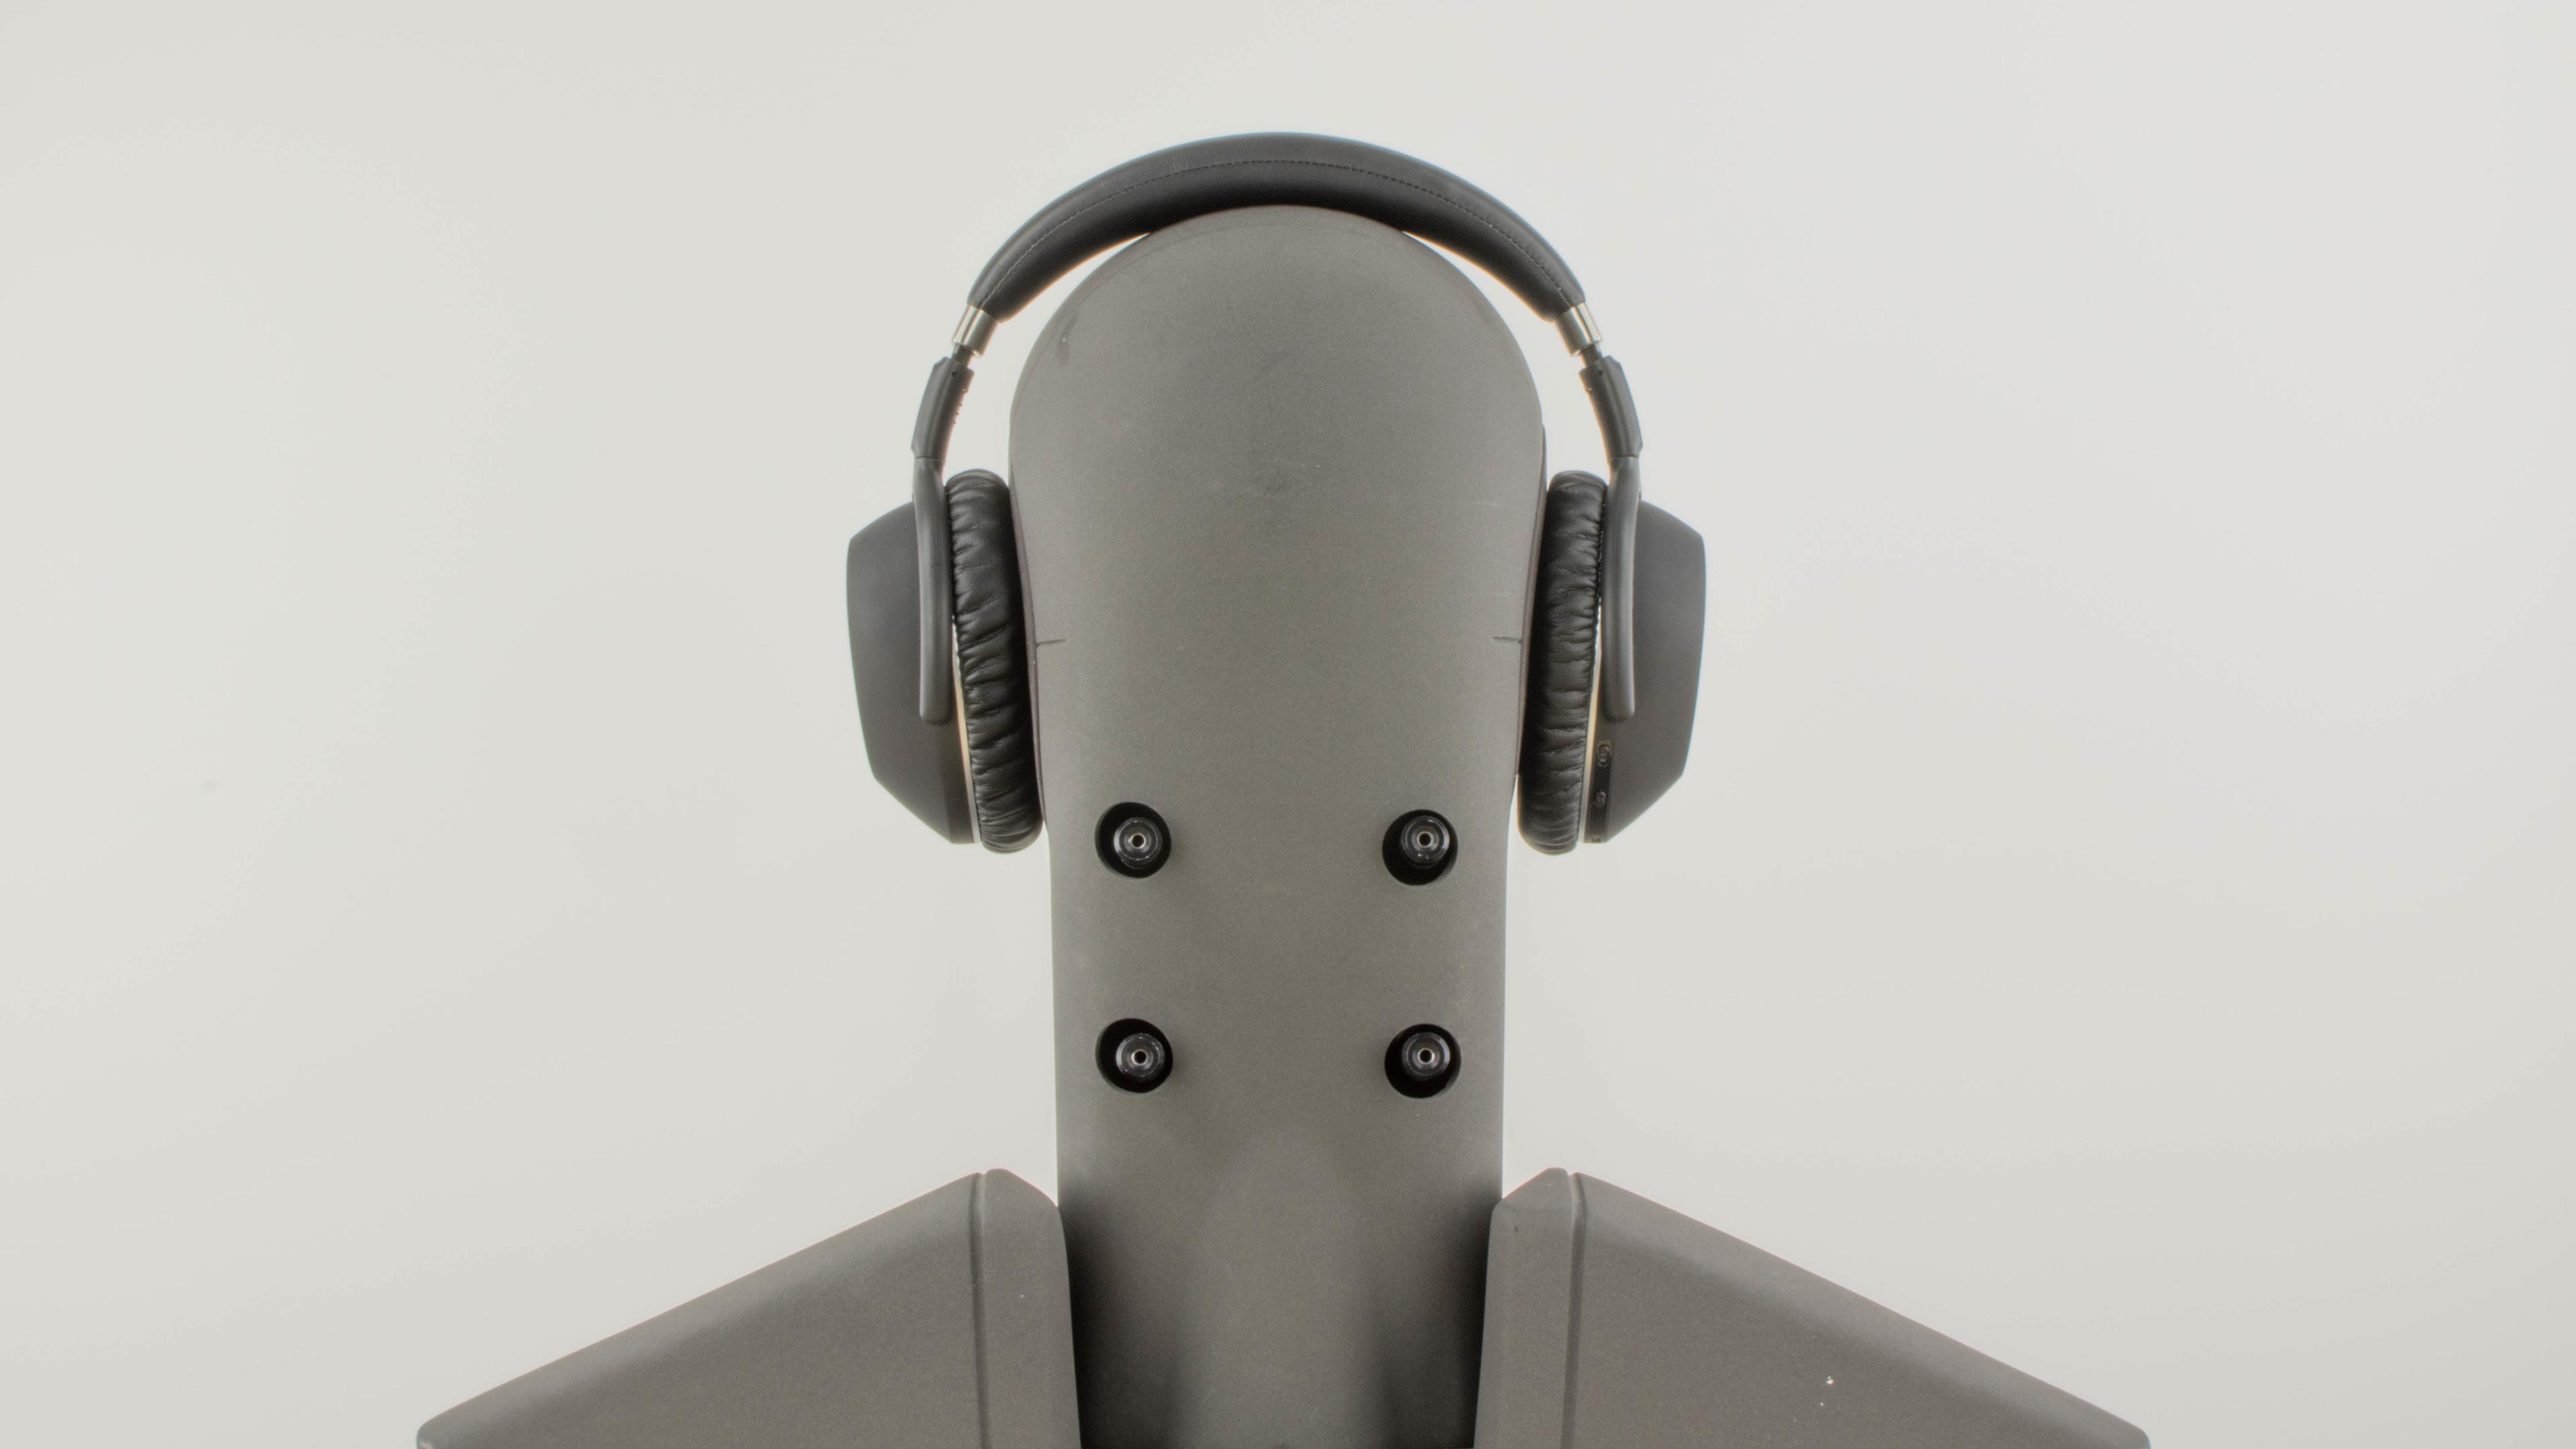 Sennheiser PXC 550 Wireless Review - RTINGS.com